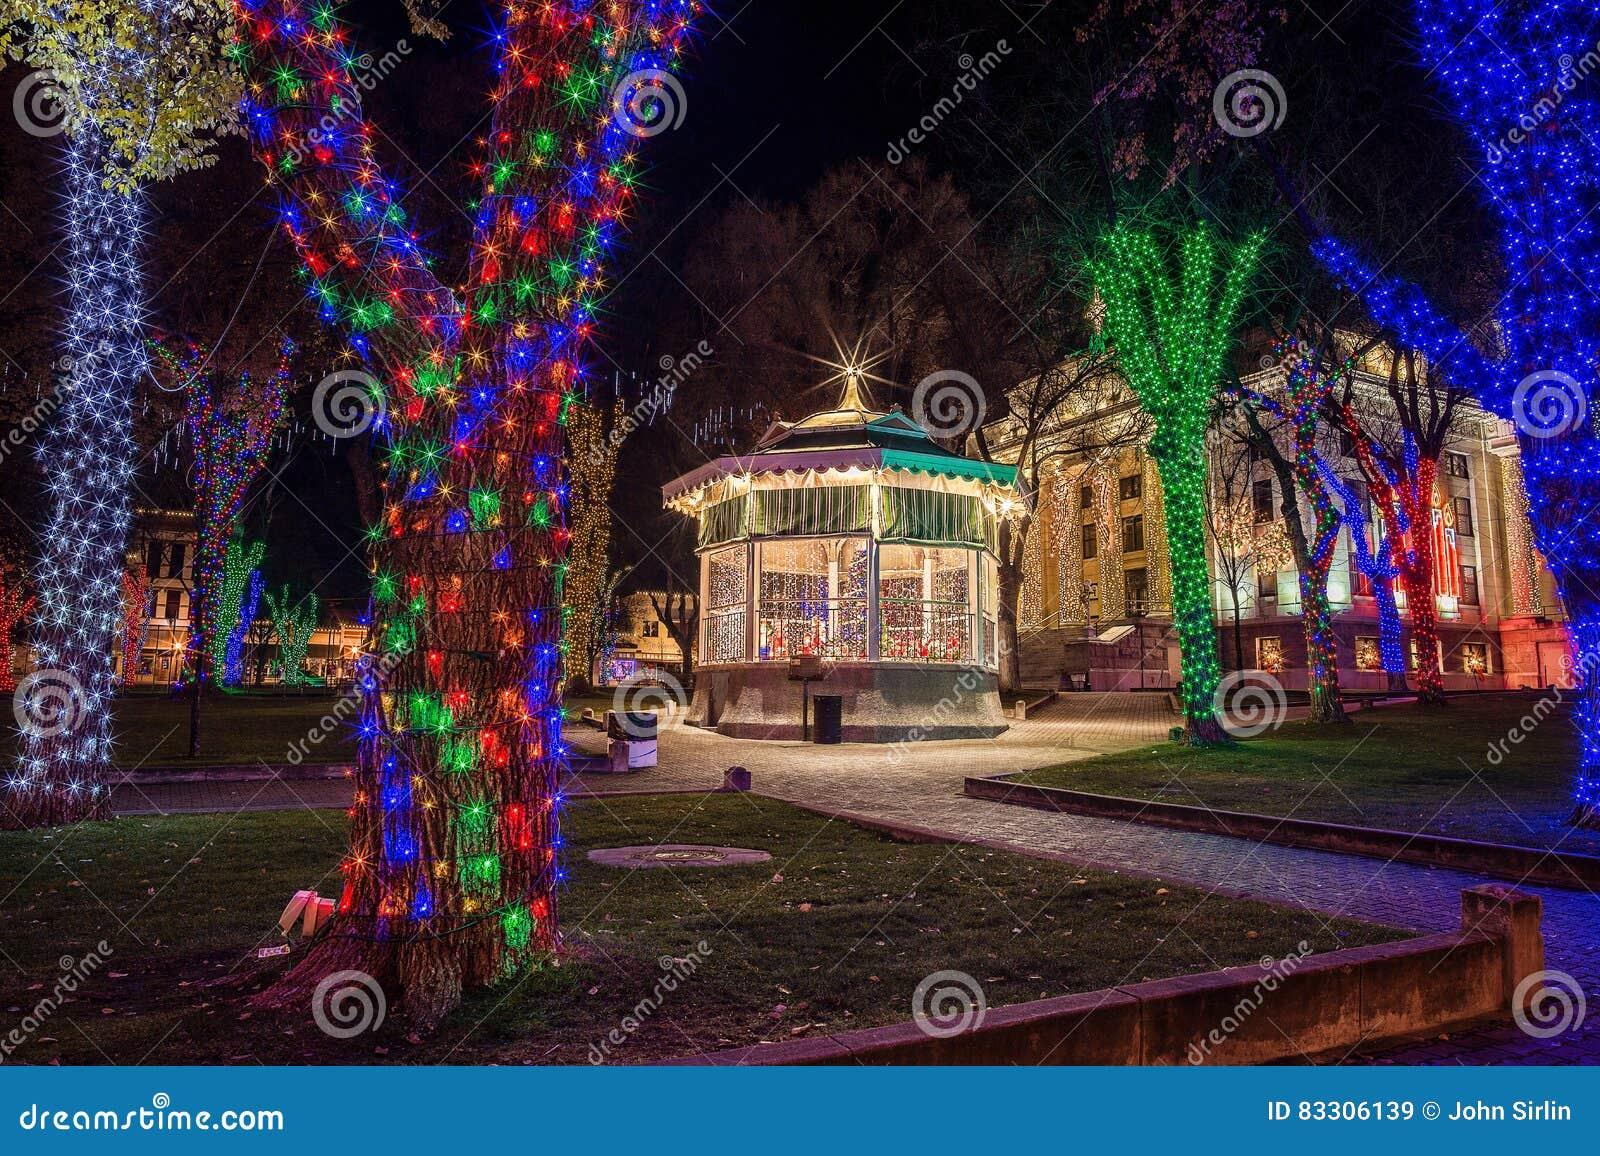 2021 Christmas Square Lighting Prescott Az Prescott Arizona Town Square With Christmas Lights Editorial Stock Image Image Of Holiday Prescott 83306139